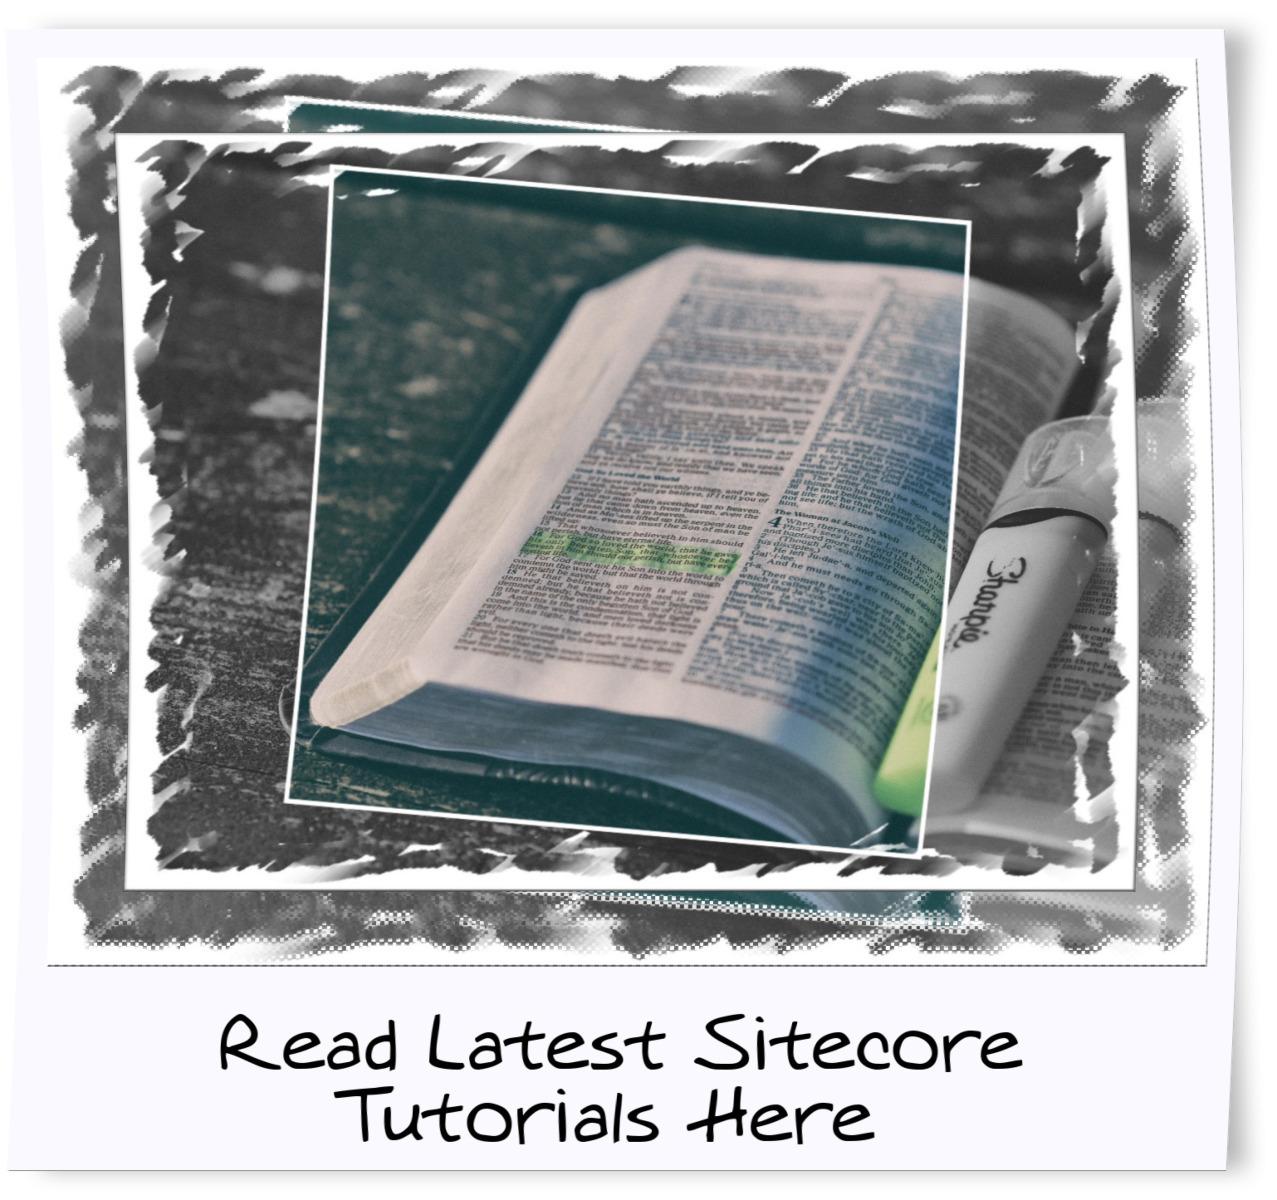 Sitecore Latest News